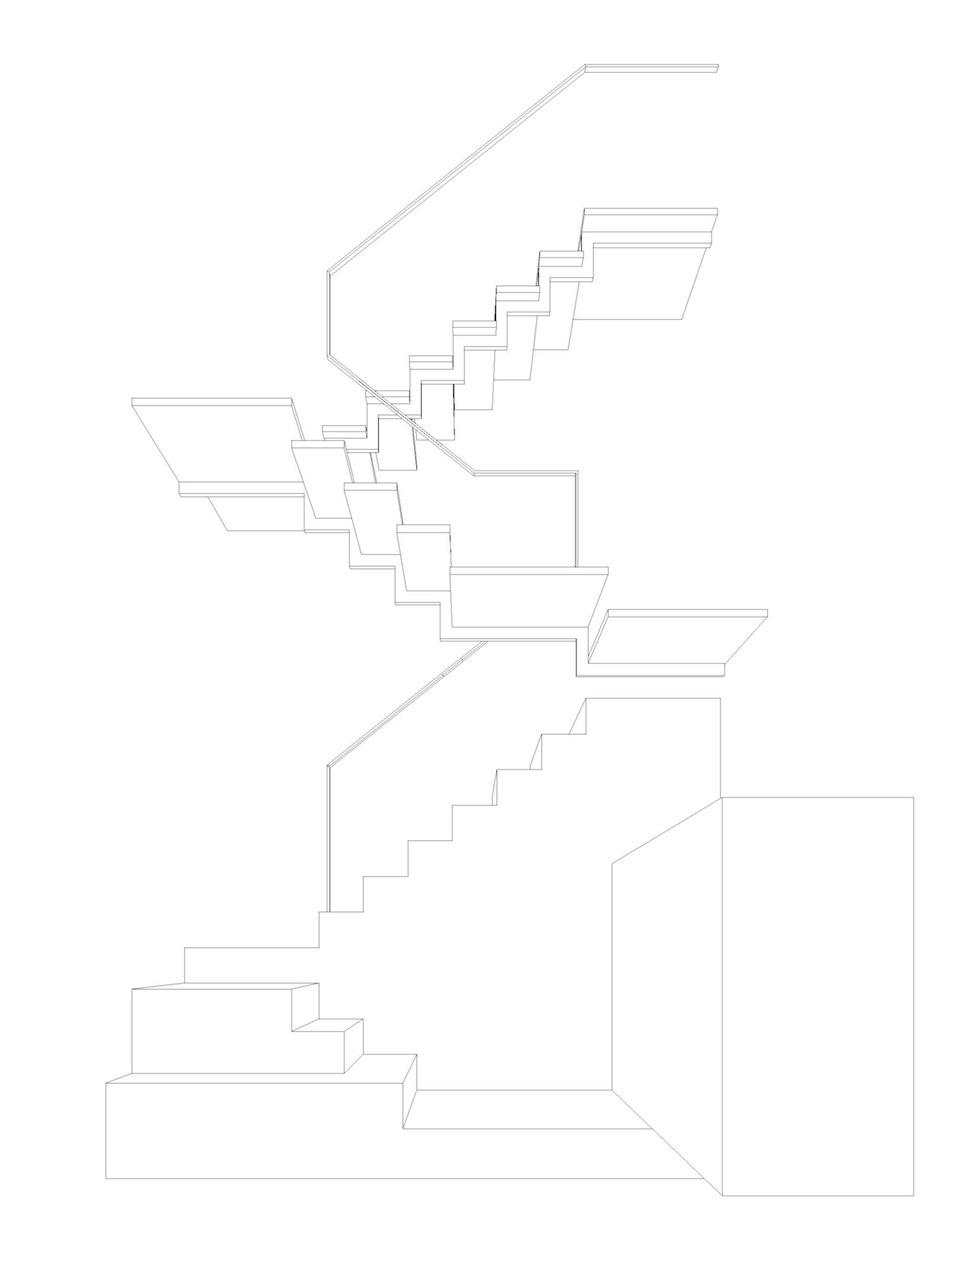 階段デザイン,スチール階段,建築家,設計事務所,高級注文住宅,階段ディテール,大阪,京都,神戸,滋賀